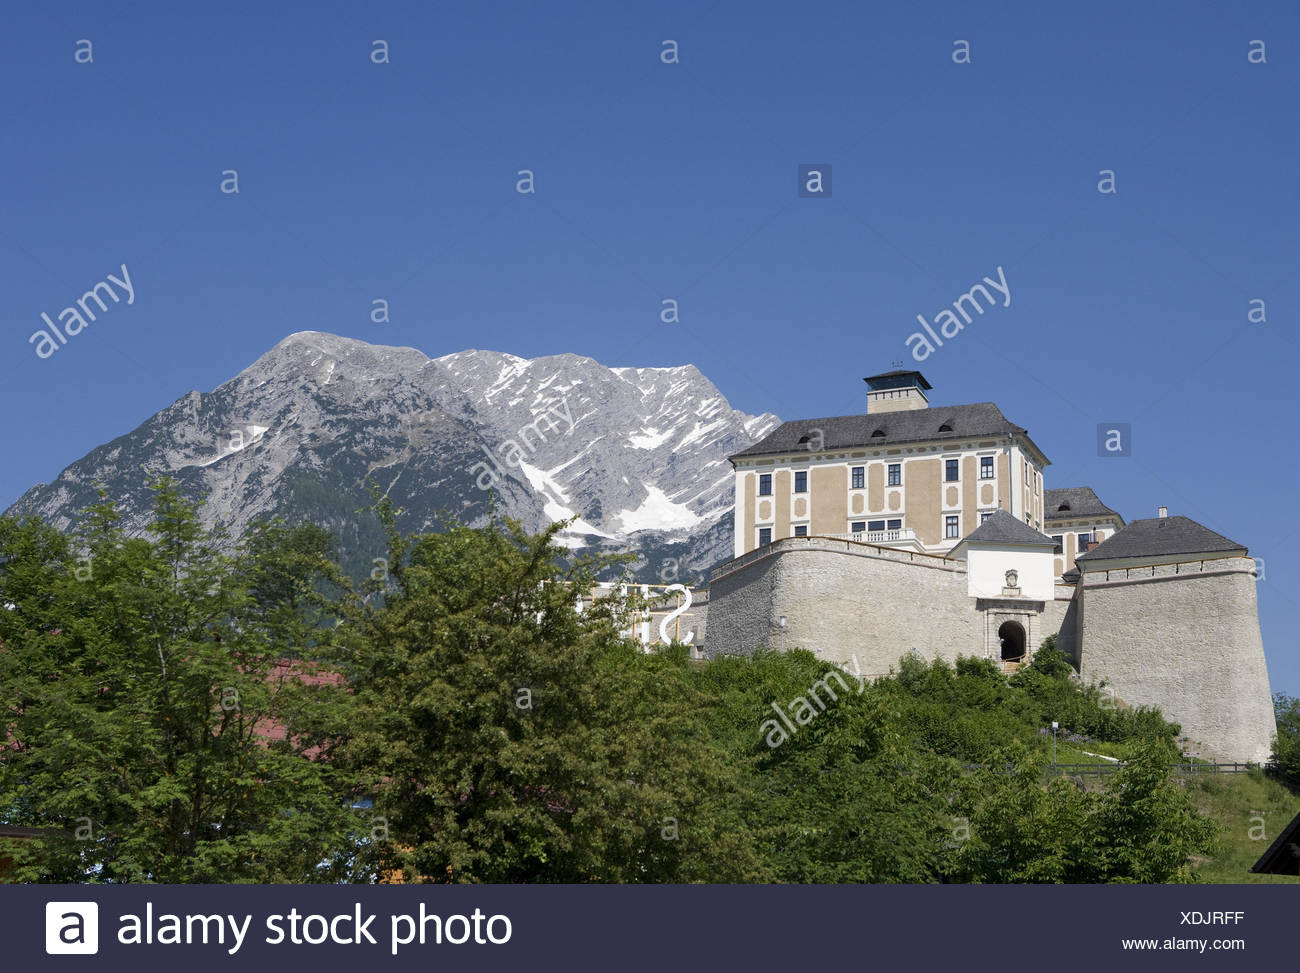 Austria, Styria, lock of familiar bile, - Stock Image